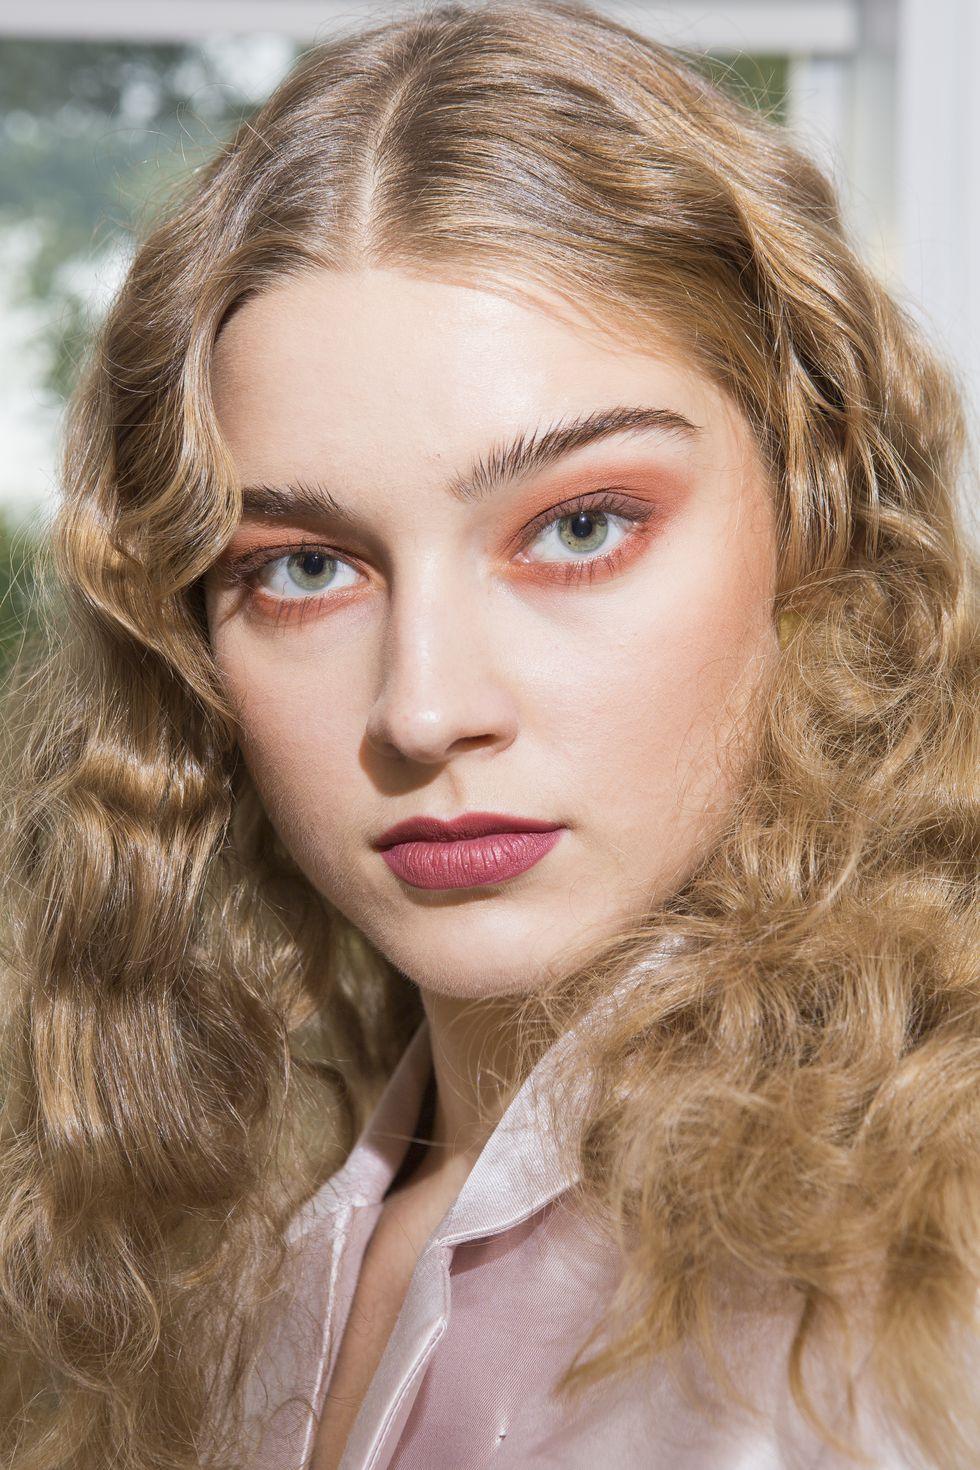 spring-summer-2018-hair-makeup-trends-cynthia-rowley-1506692567